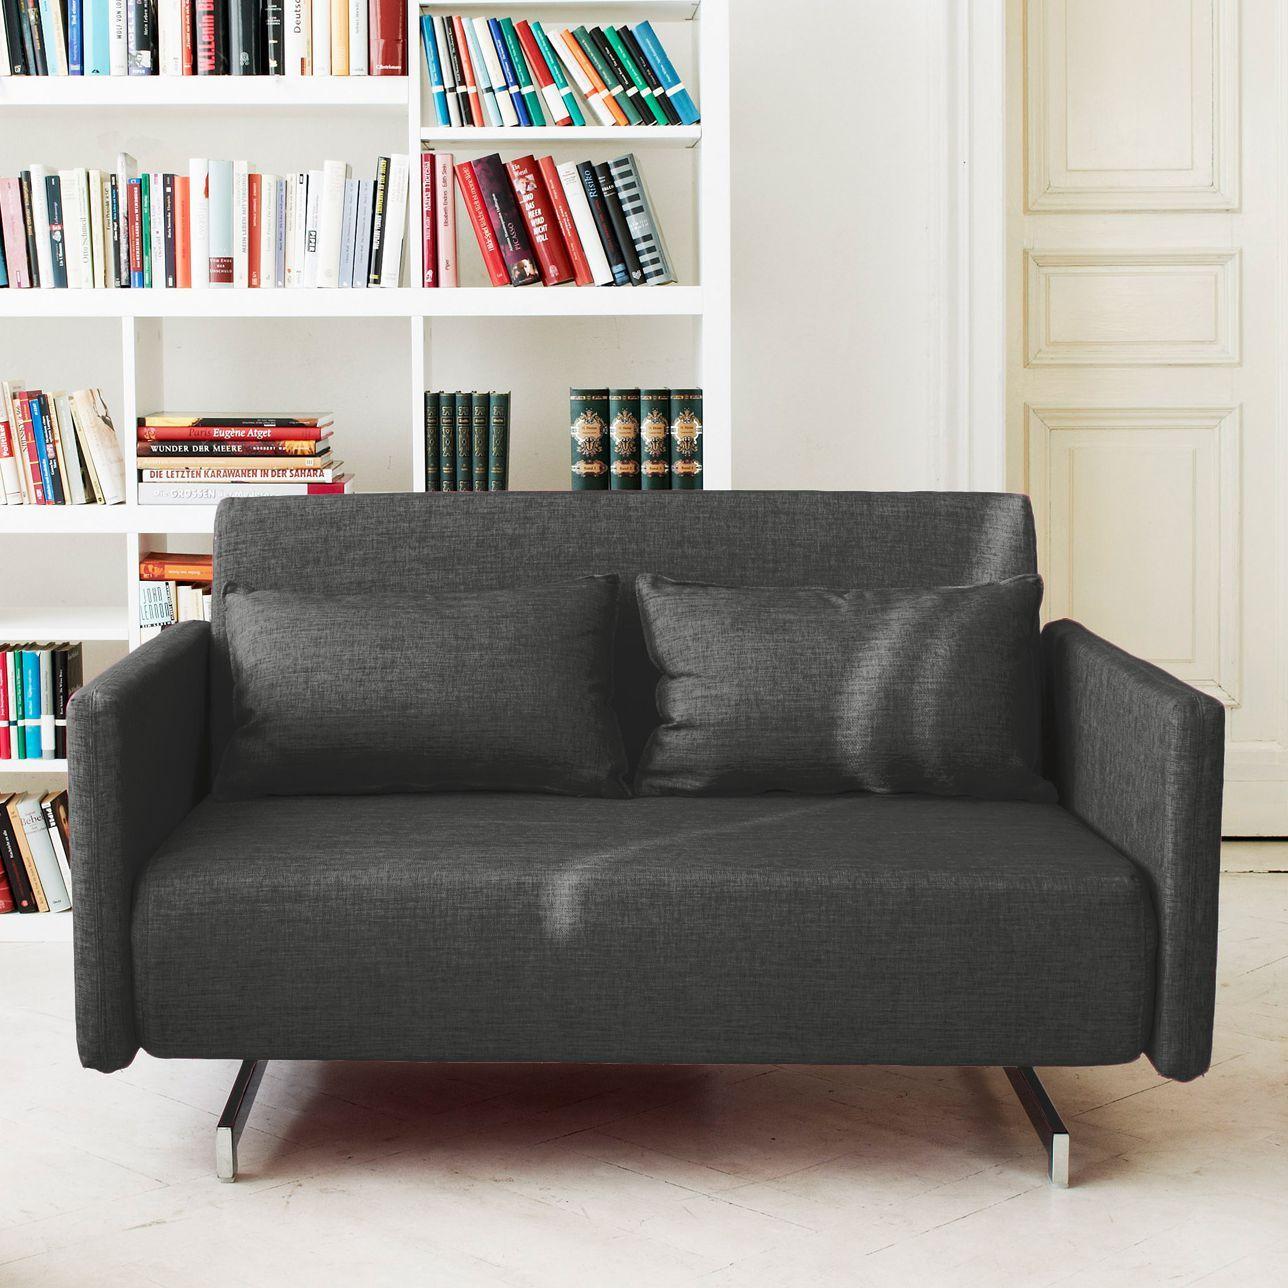 Schlafsofa Dendera B Webstoff In 2019 Products Schlafsofa Sofa Modernes Schlafsofa